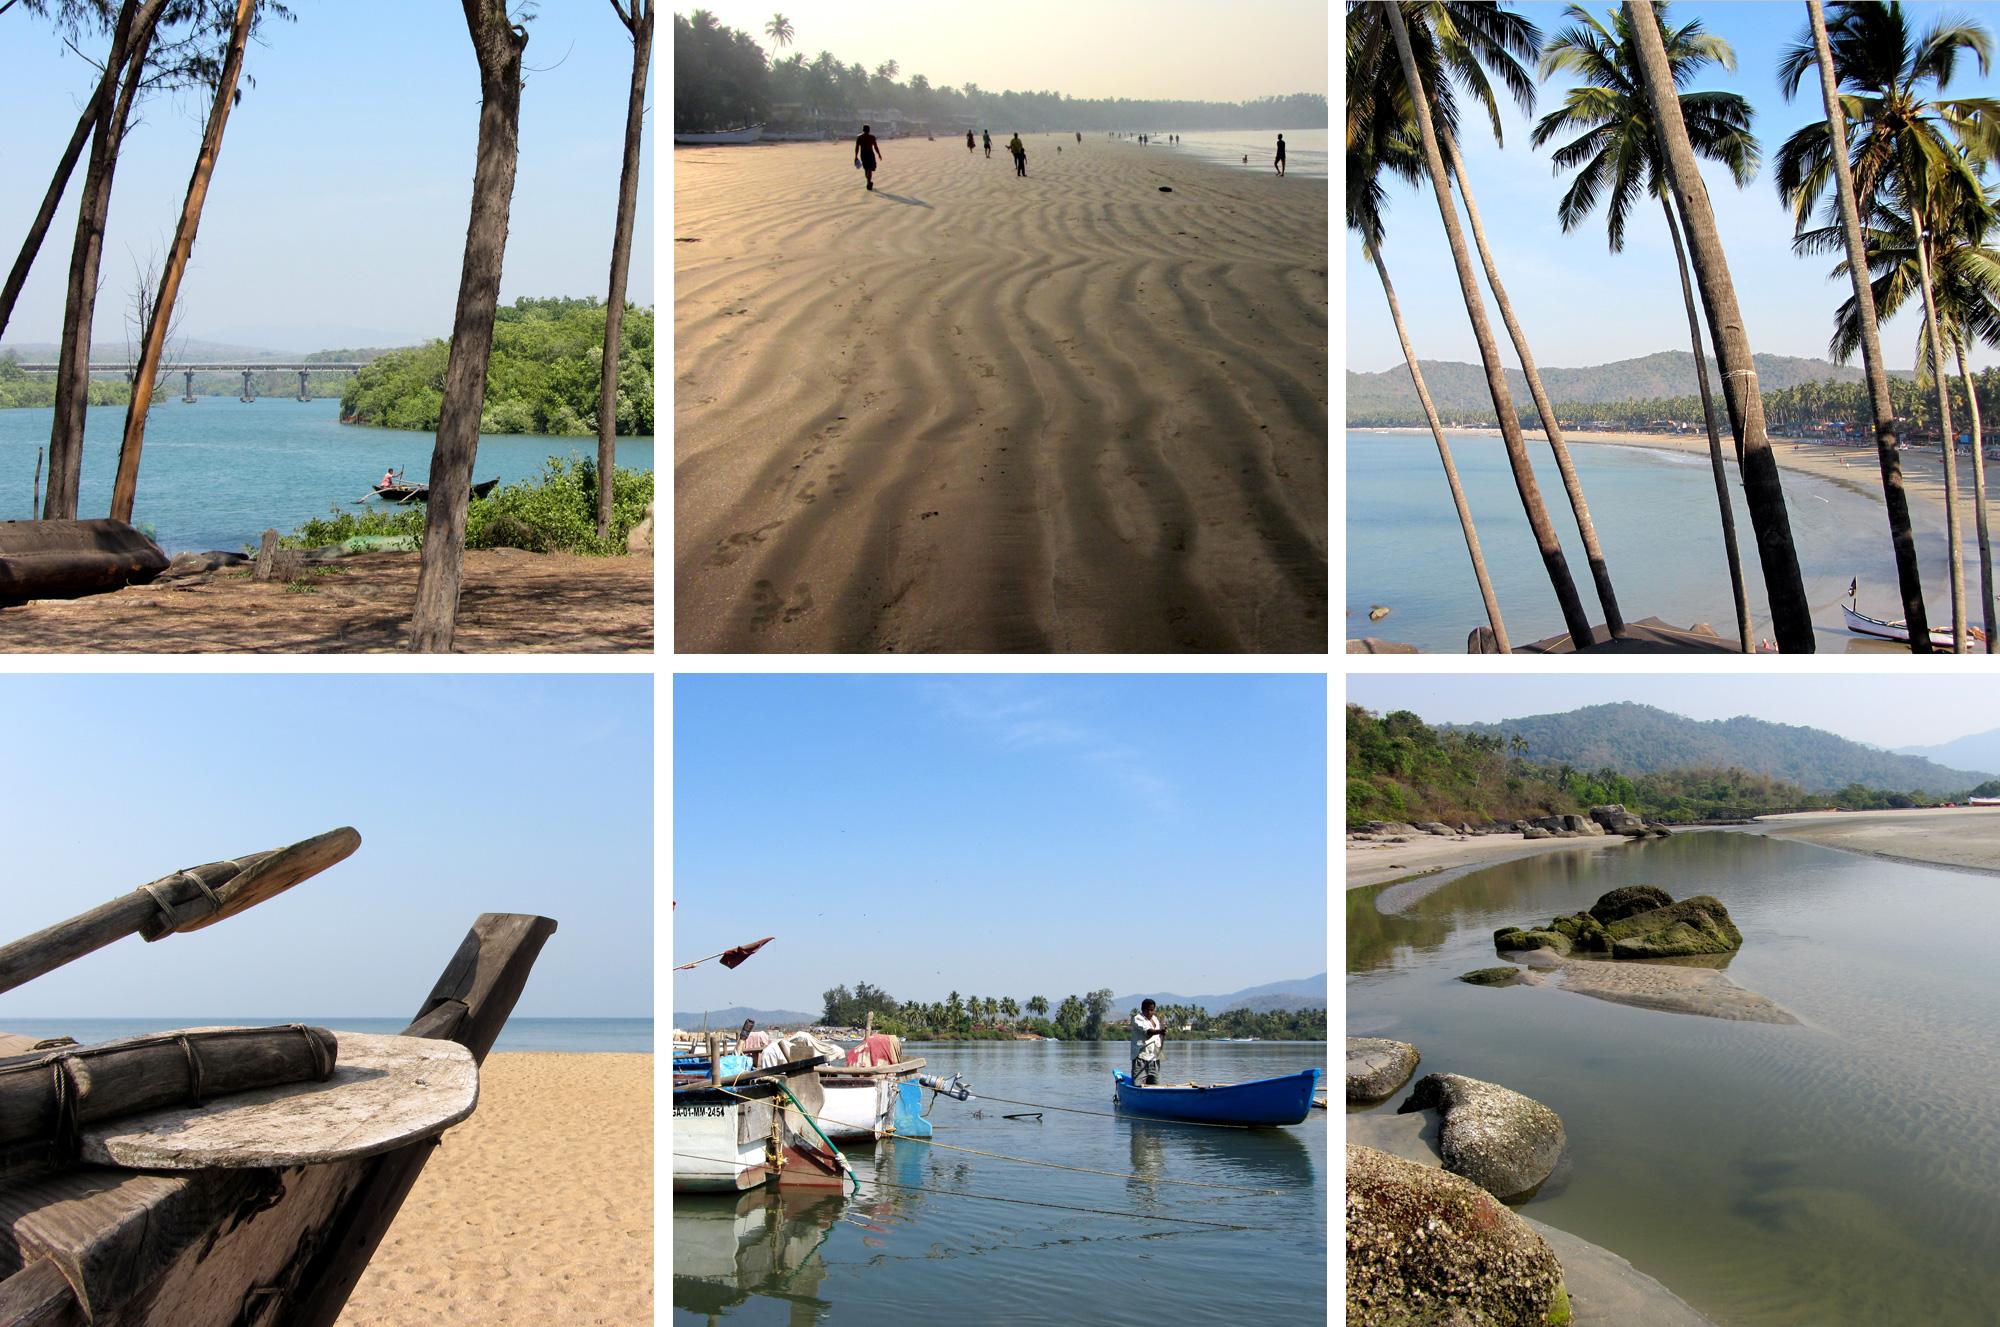 Beautiful Peaceful South Goa Coastline, 6 snaps to feed my inspiration... #goa #goabeaches #goacoast #goainspiration    Join me on Instagram www.instagram.com/ rowenagilbertceramics